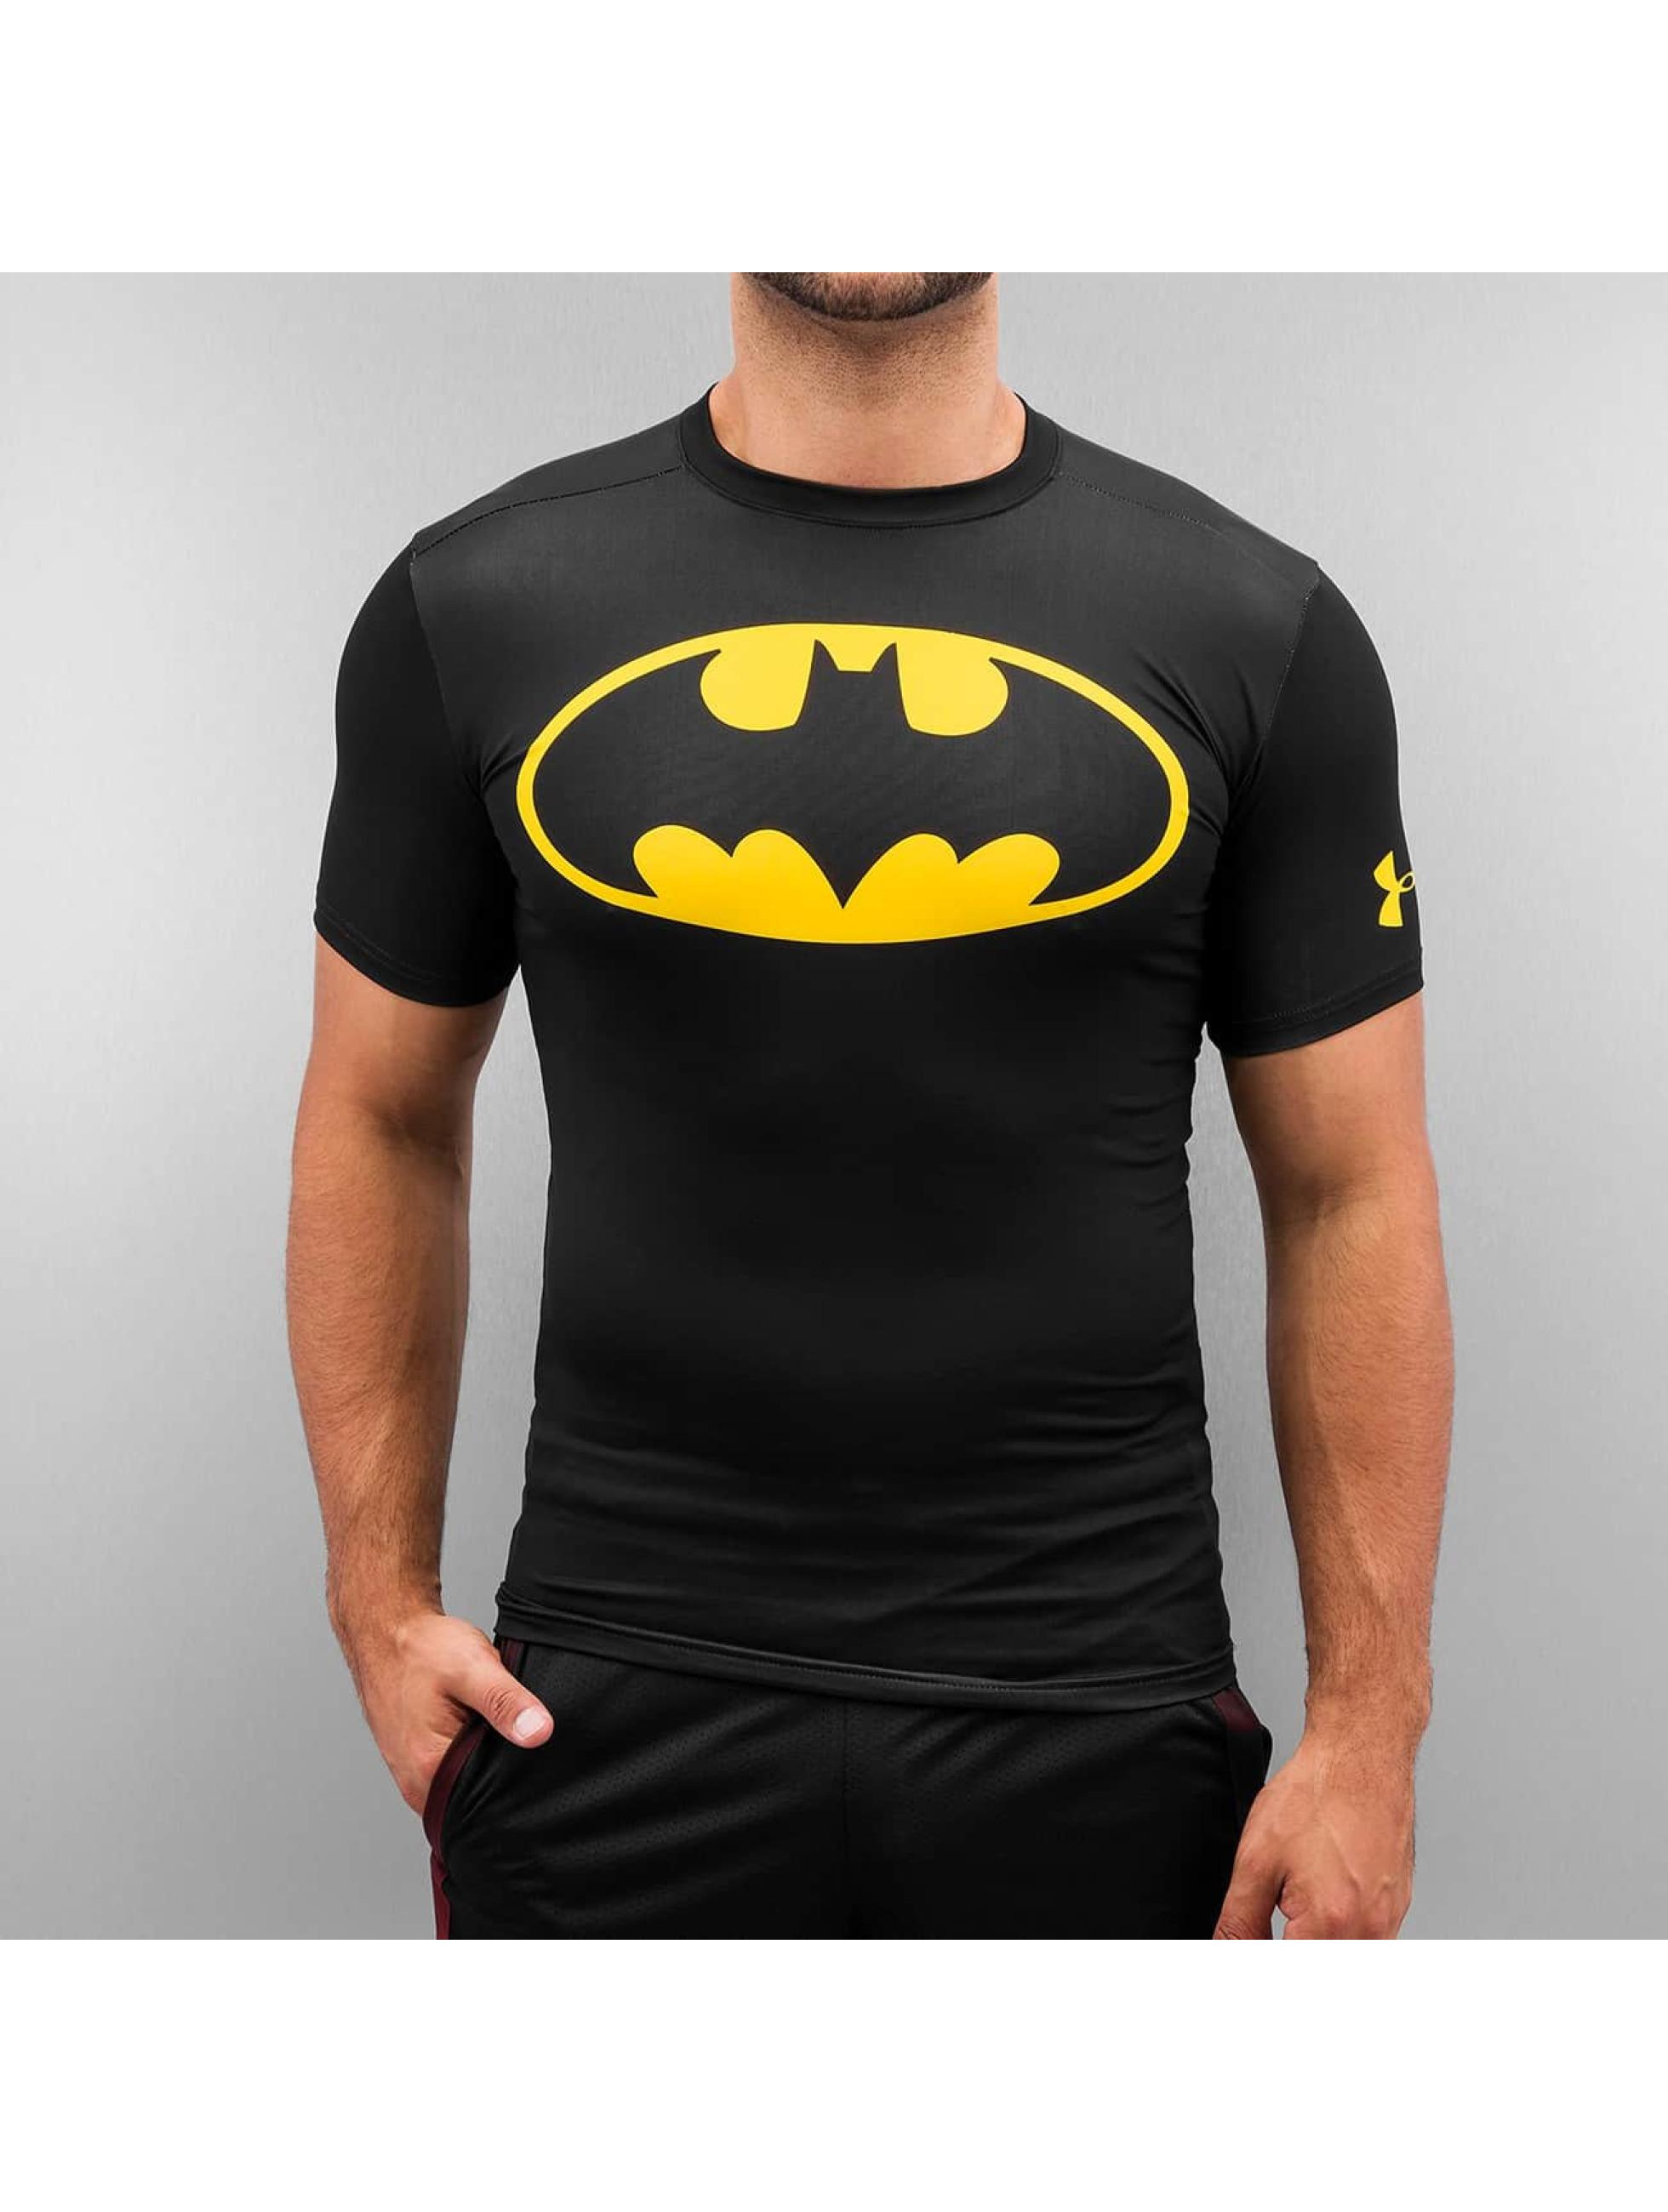 Under Armour Футболка Alter Ego Batman Compression черный